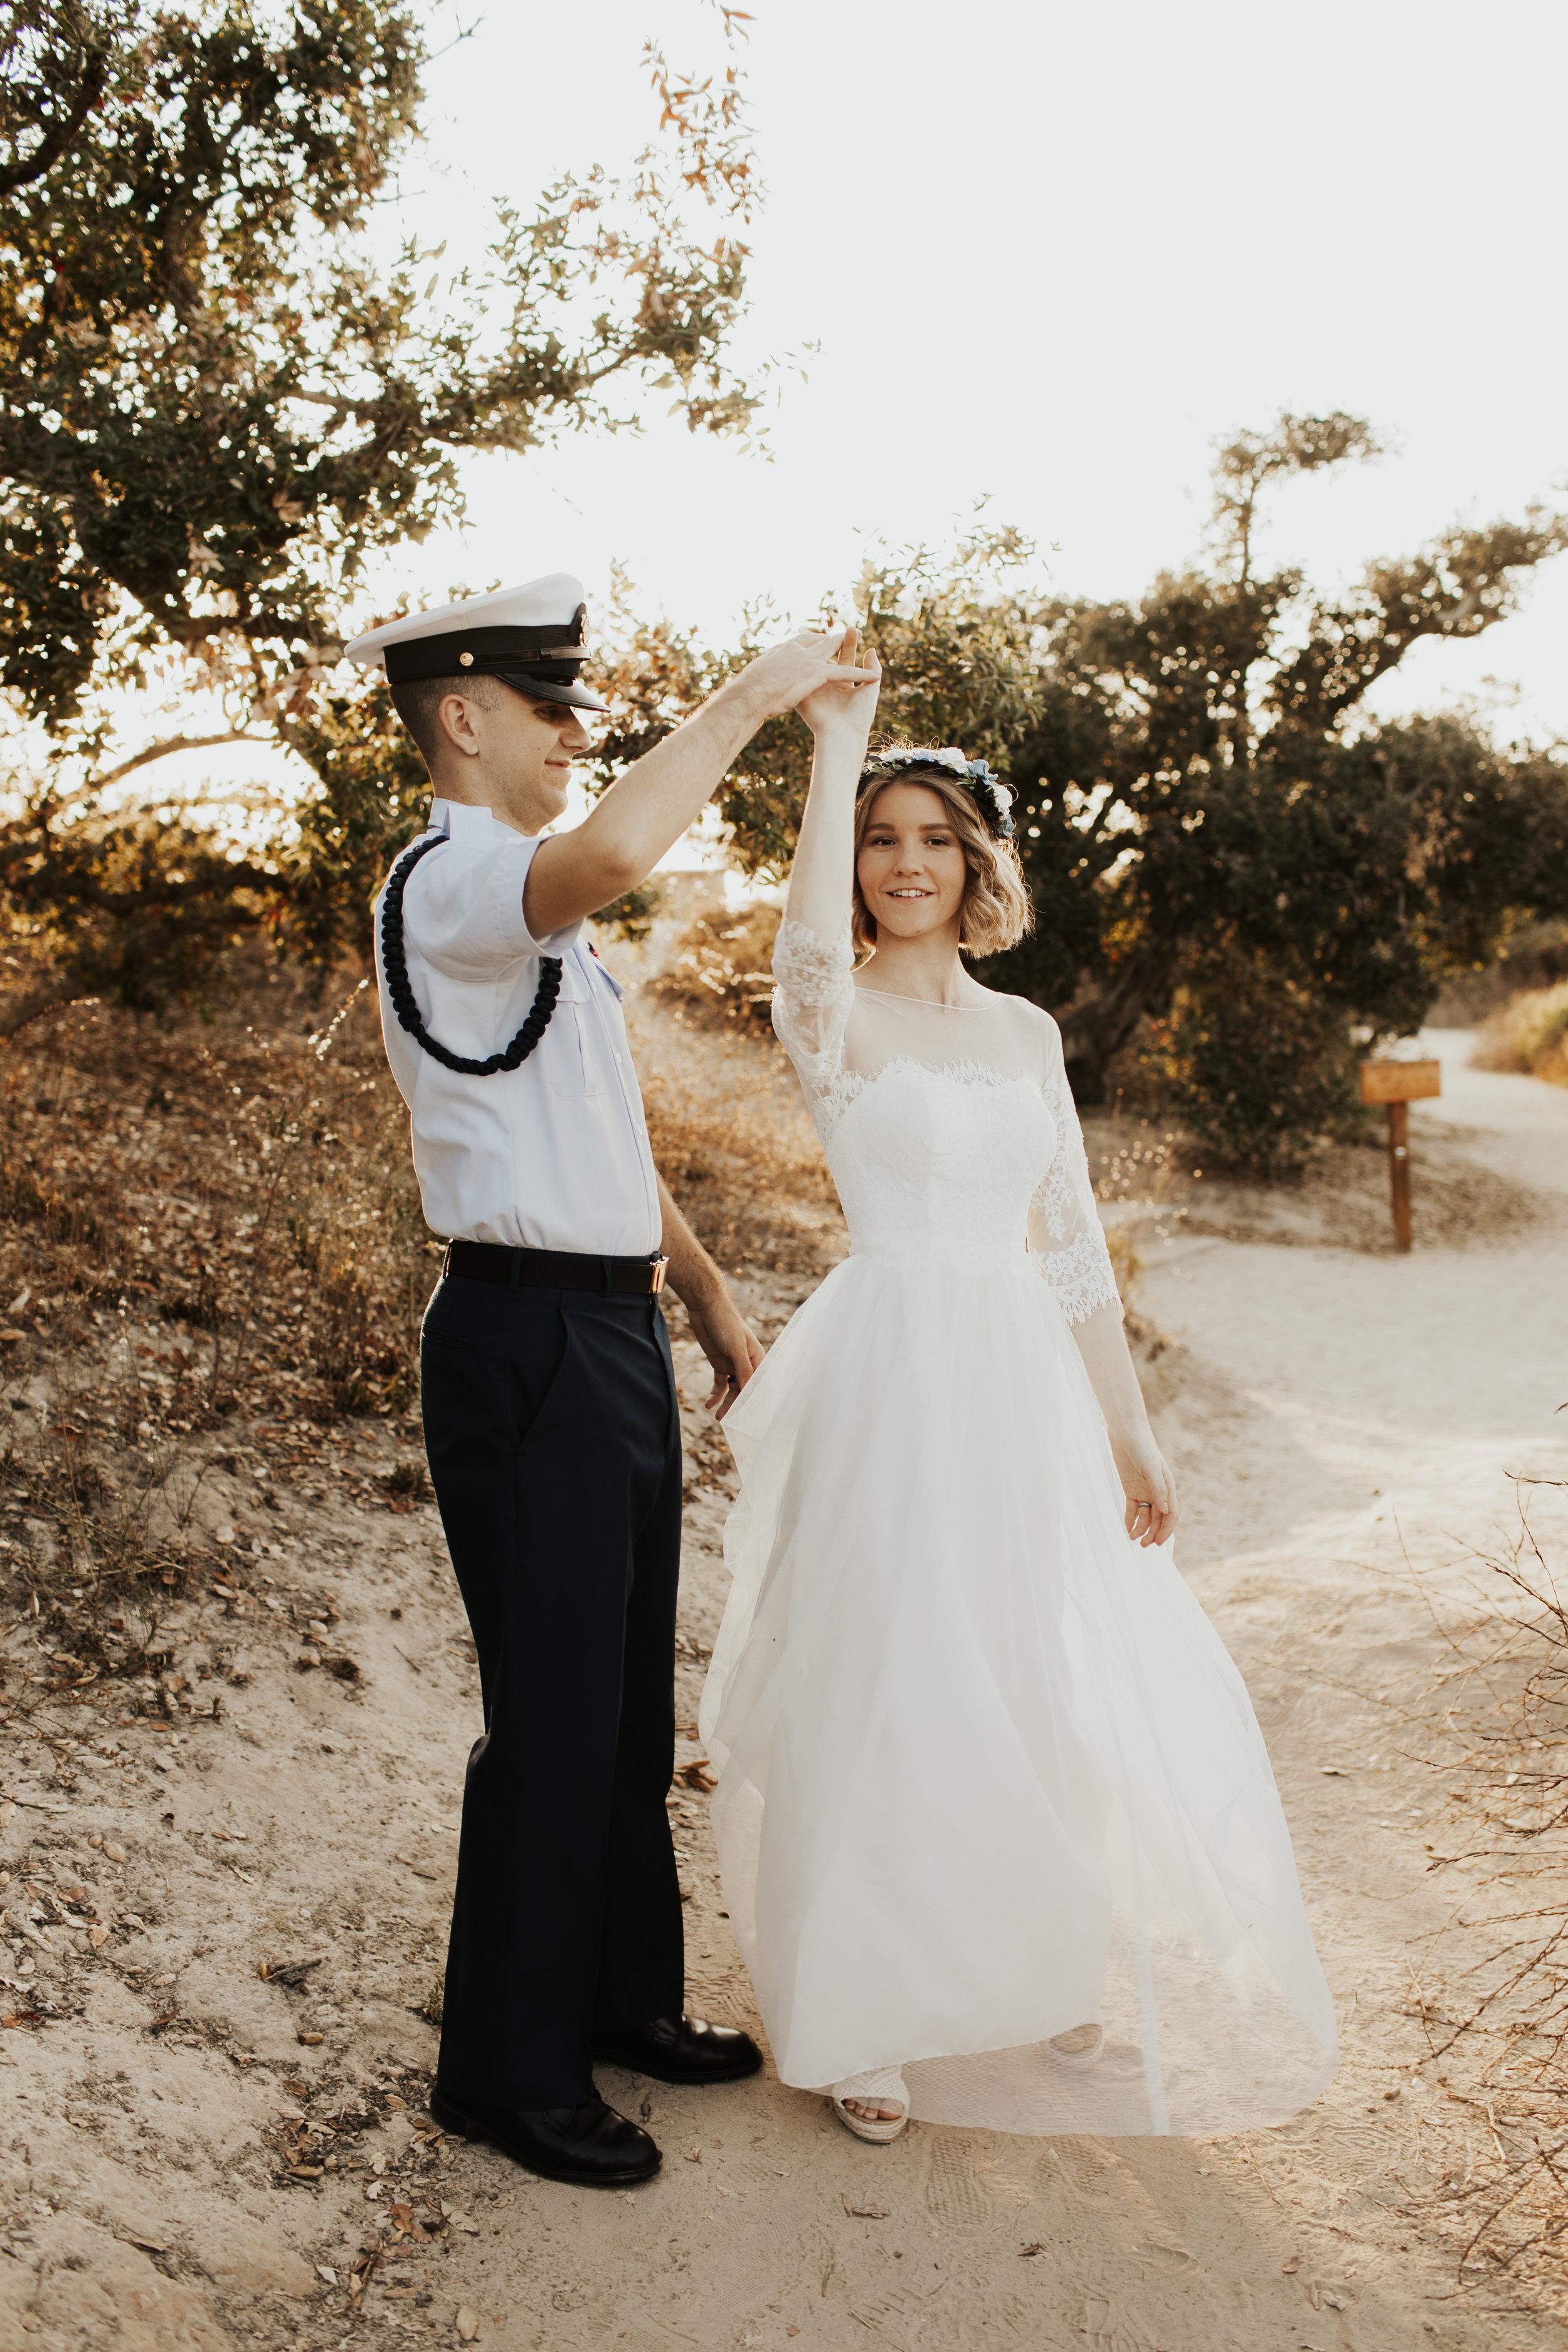 Jessie-Noah-Top-of-the-World-Laguna-Beach-Elopement-Bridal-Wedding-Session-FINISHED-14.jpg